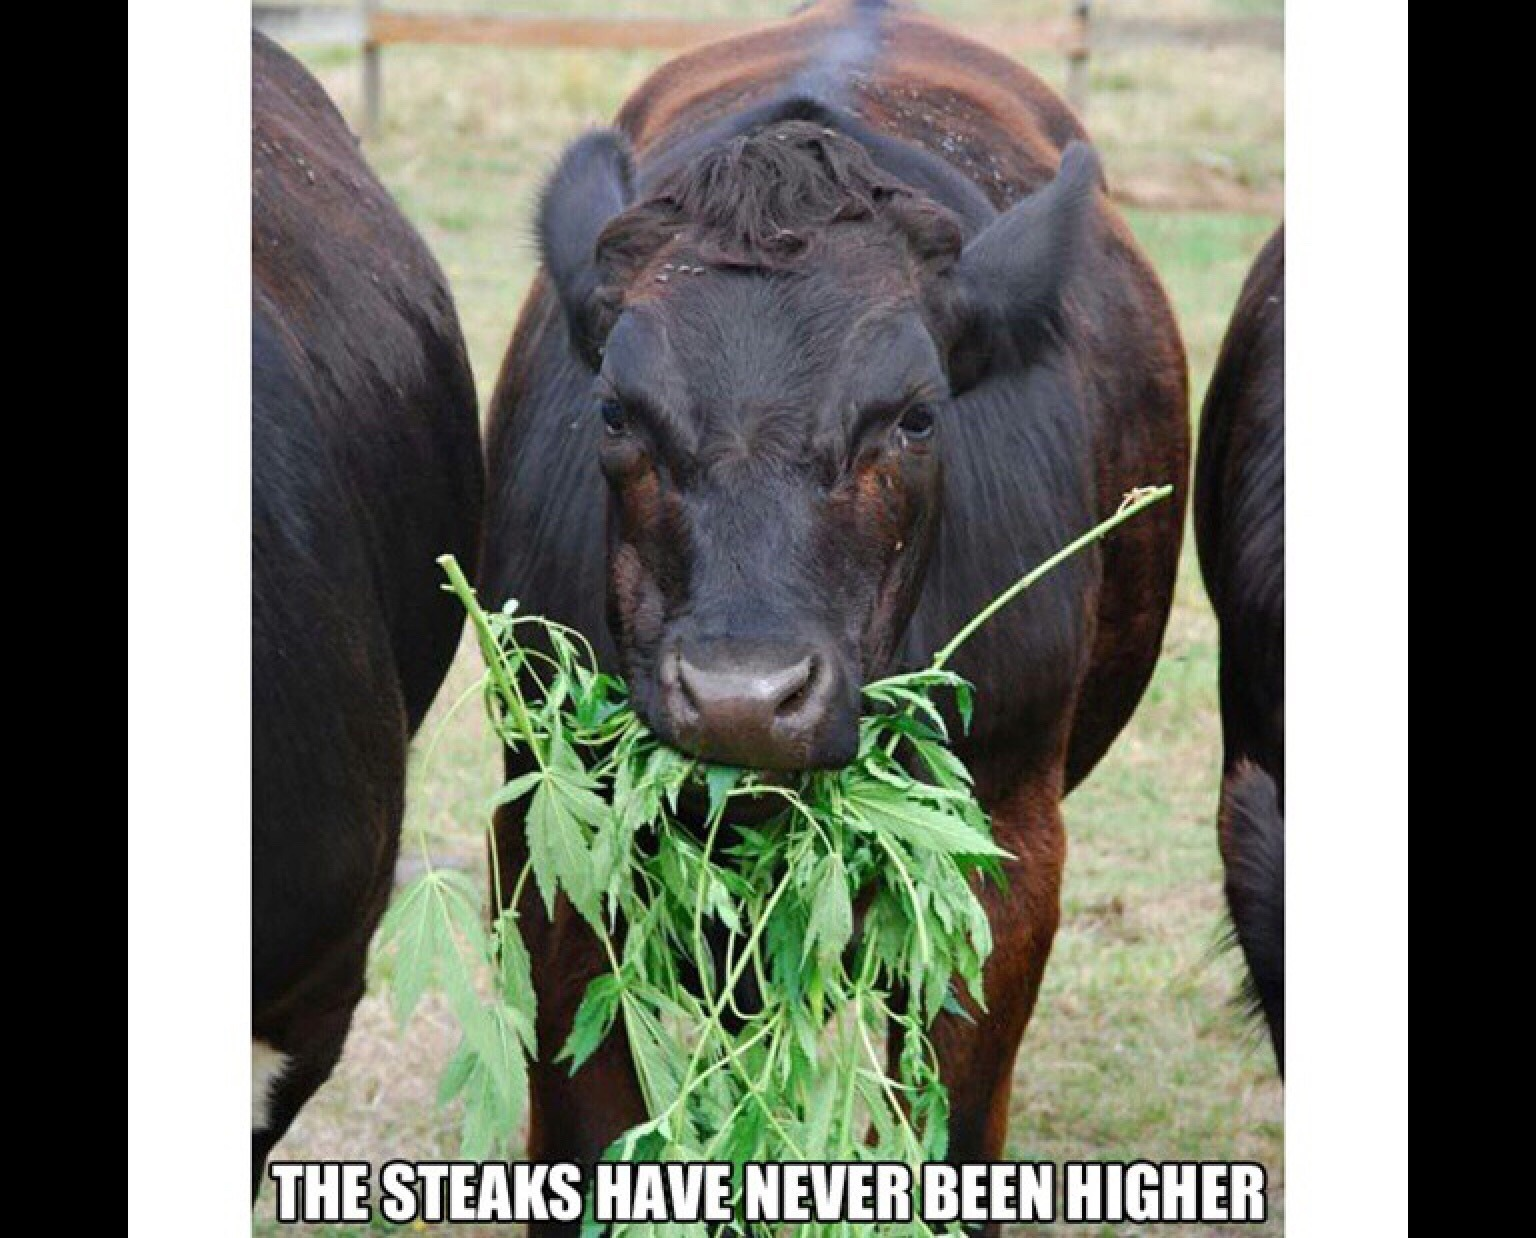 The steaks are higher - meme